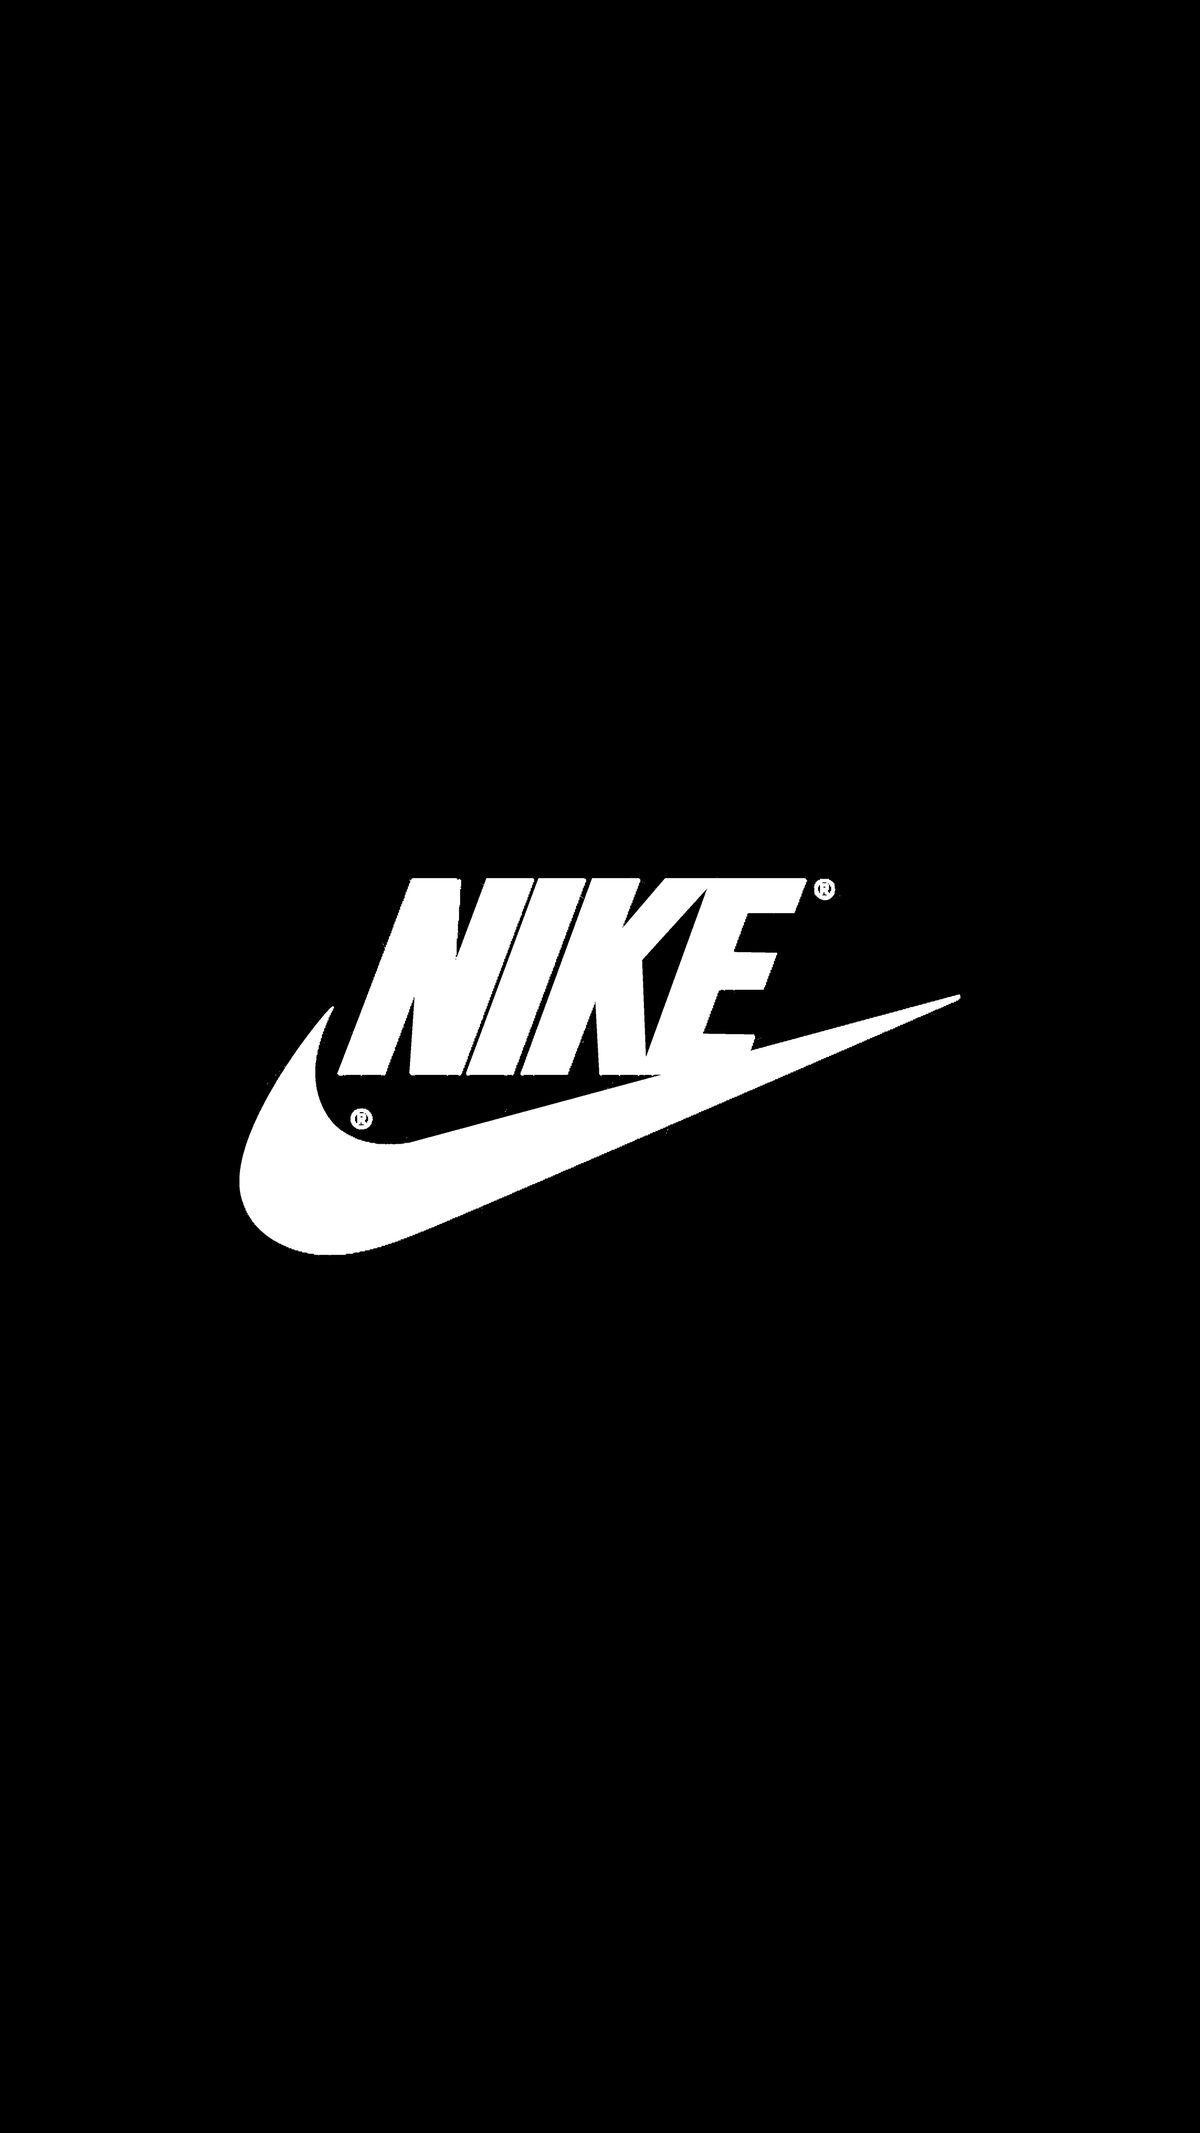 Nike 2160p/4K OLED Wallpaper in 2019 Nike wallpaper